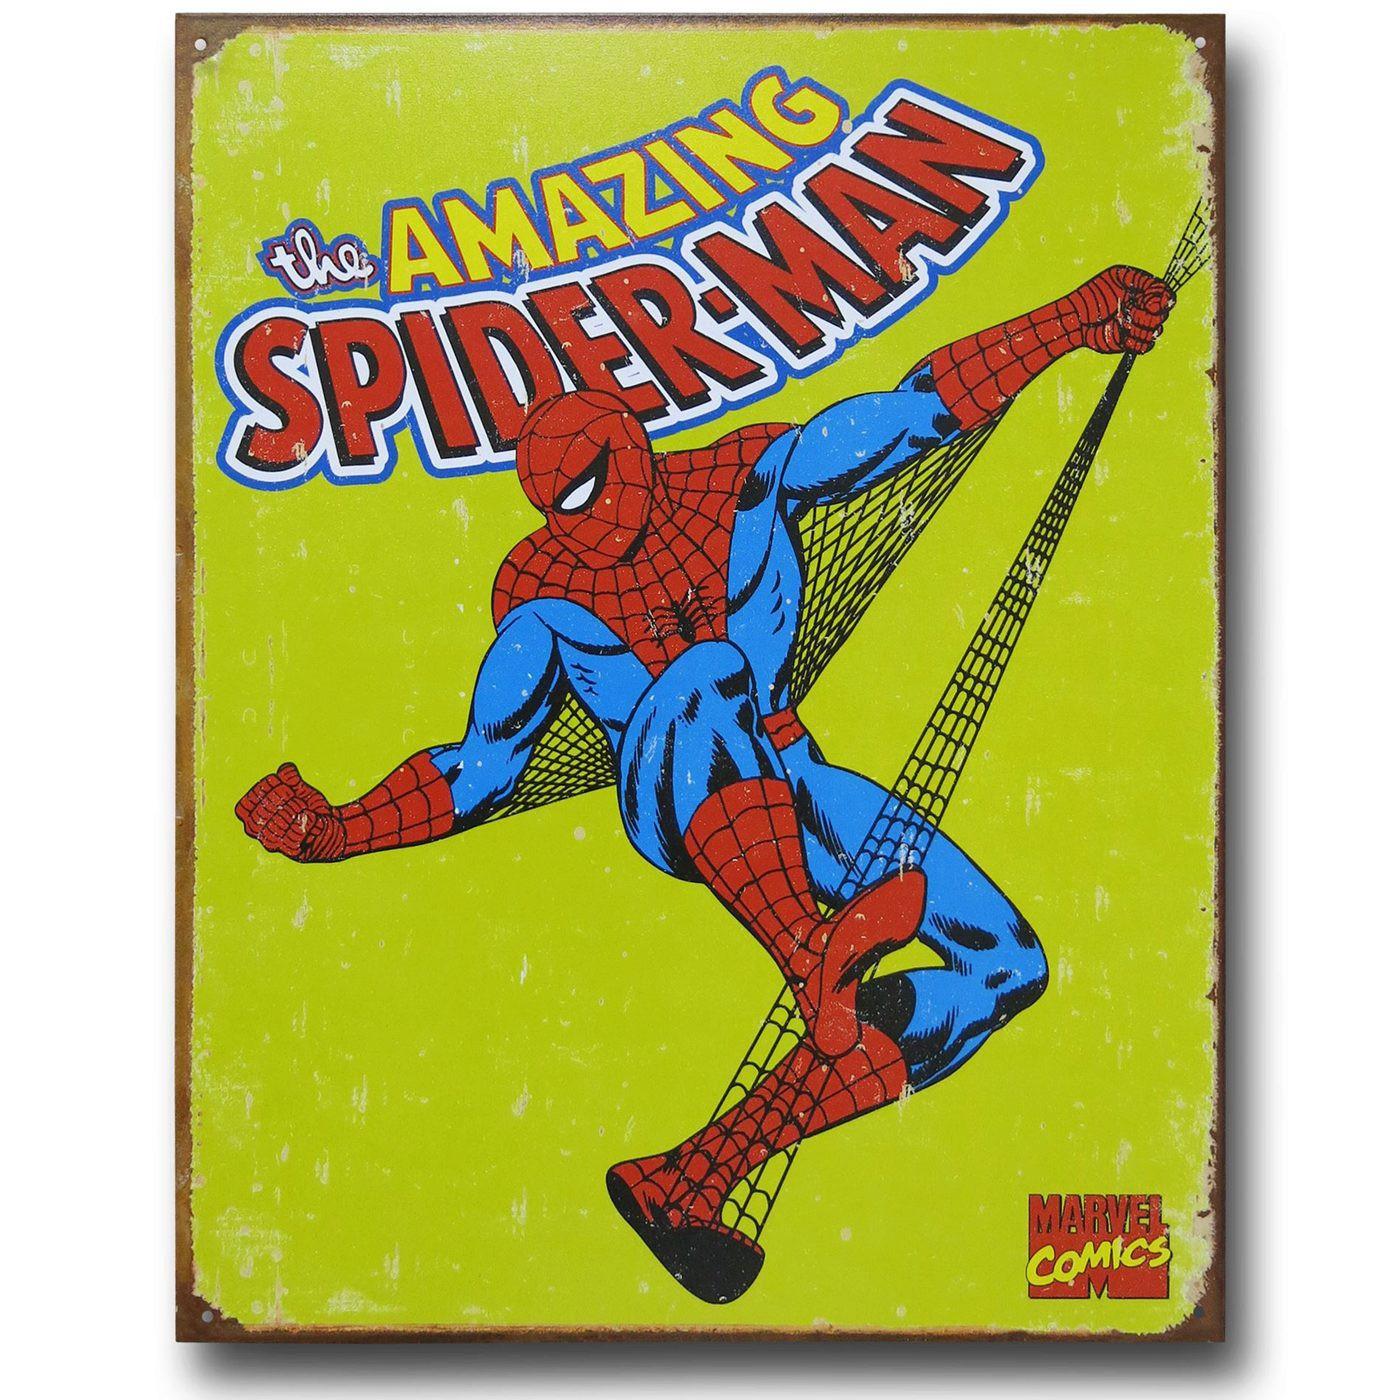 Spider-Man Yellow Vintage Tin Poster Sign